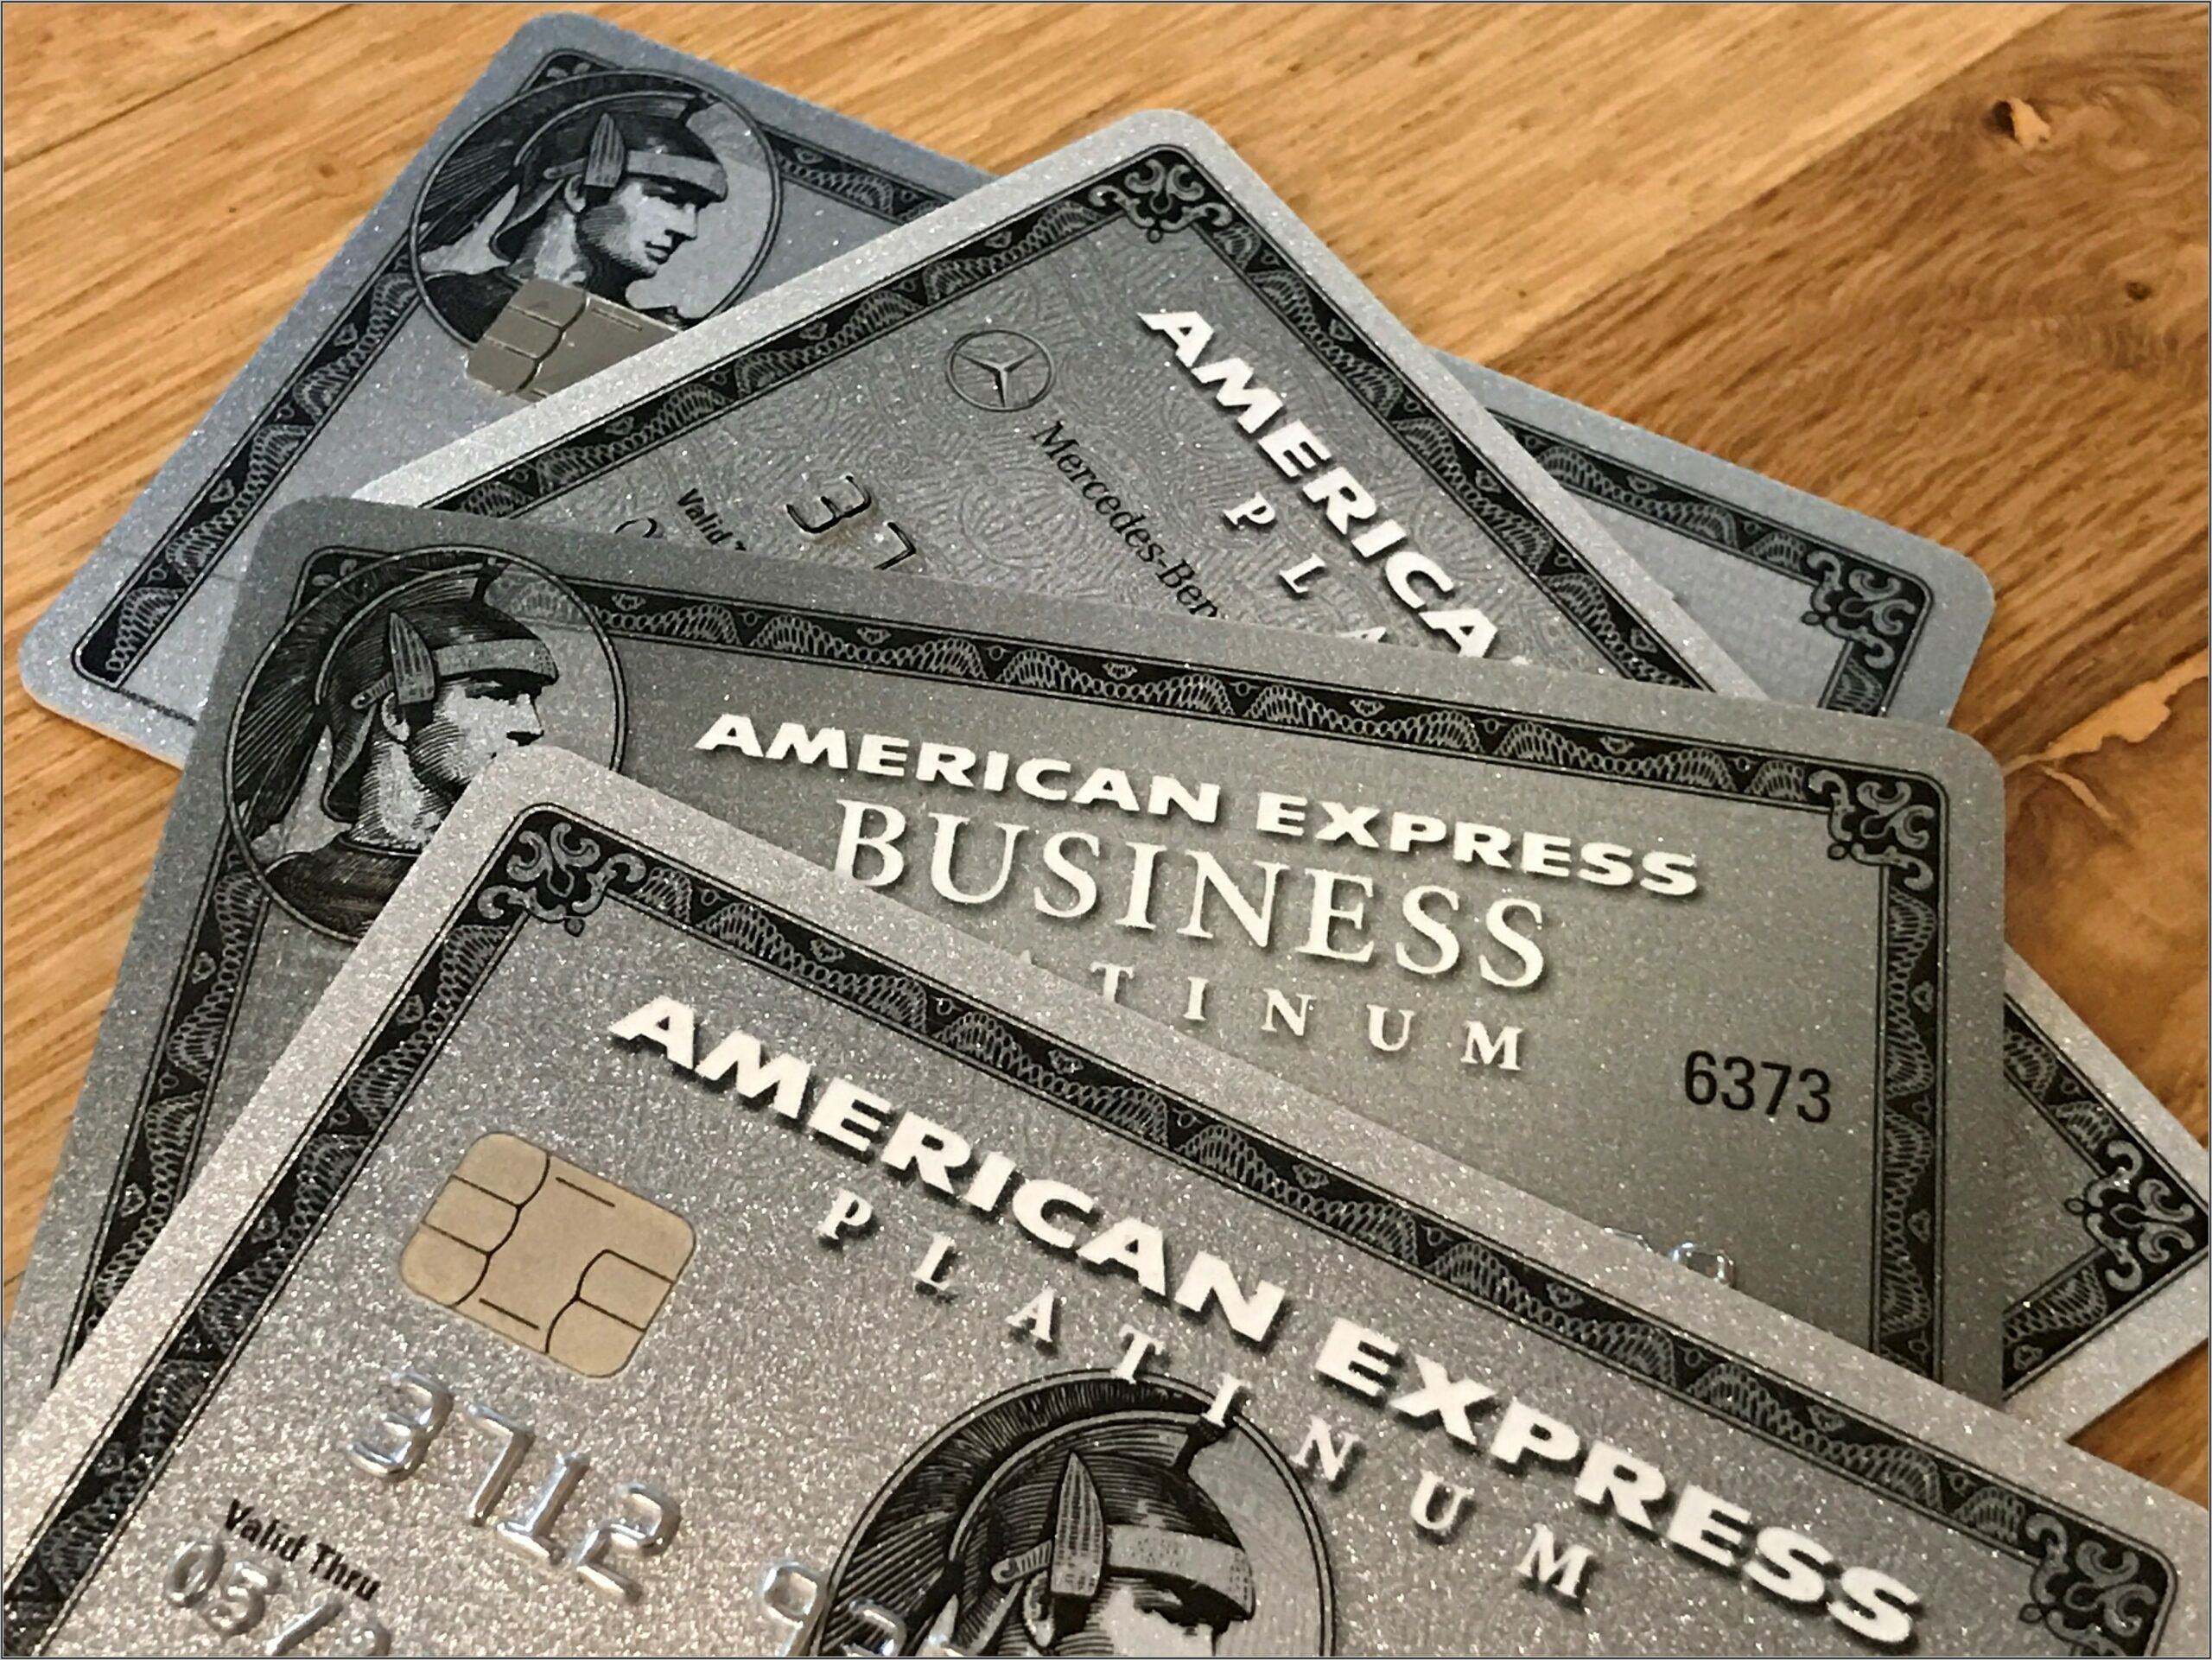 Amex Business Platinum Card Material